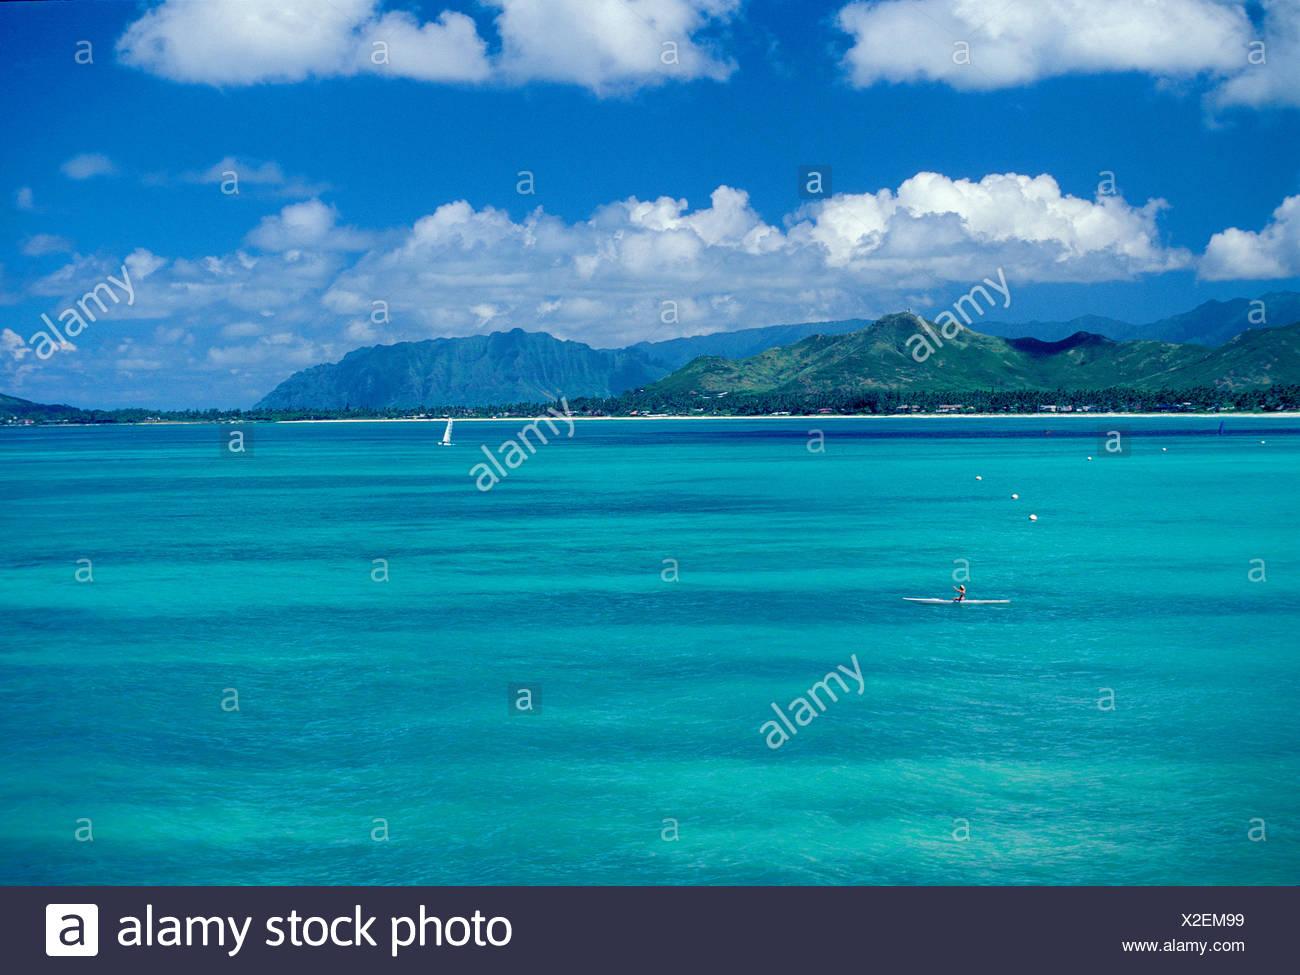 Kayaking on bluegreen waters near Kailua and Lanikai. Windward side, Oahu - Stock Image